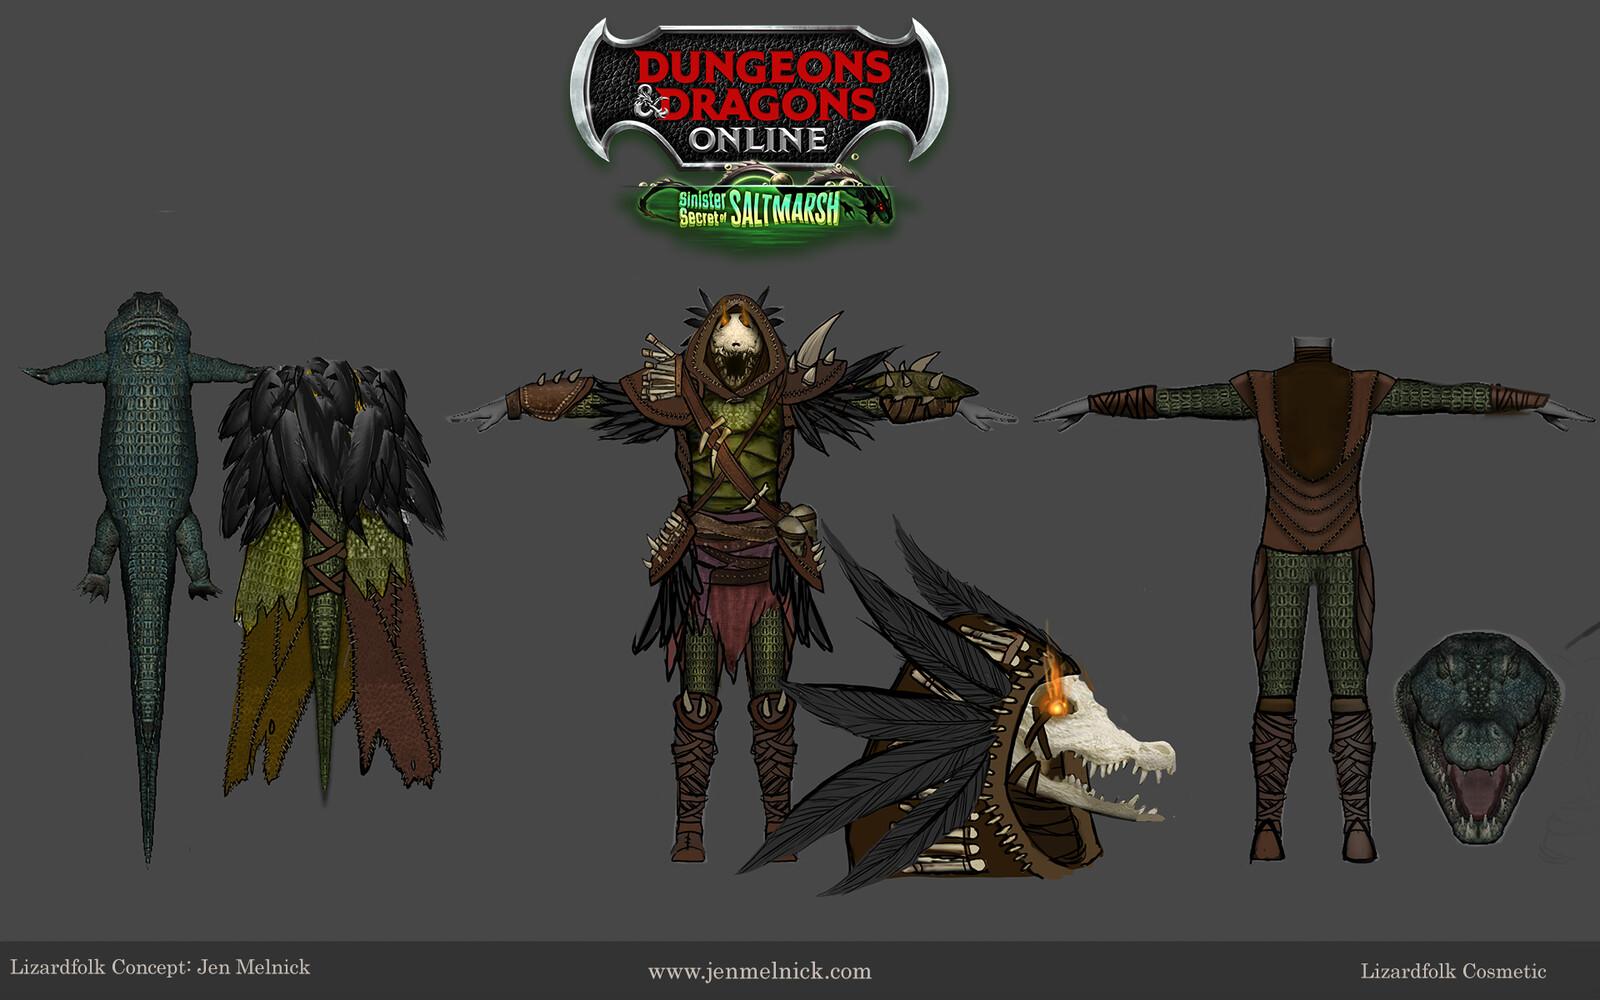 Dungeons and Dragons Online Lizardfolk Cosmetic Set: Jumpsuit, Cloak, Helmet, and Gearset Sinister Secrets of Saltmarsh Mini-Expansion  Ultimate Fan Bundle Reward Concept